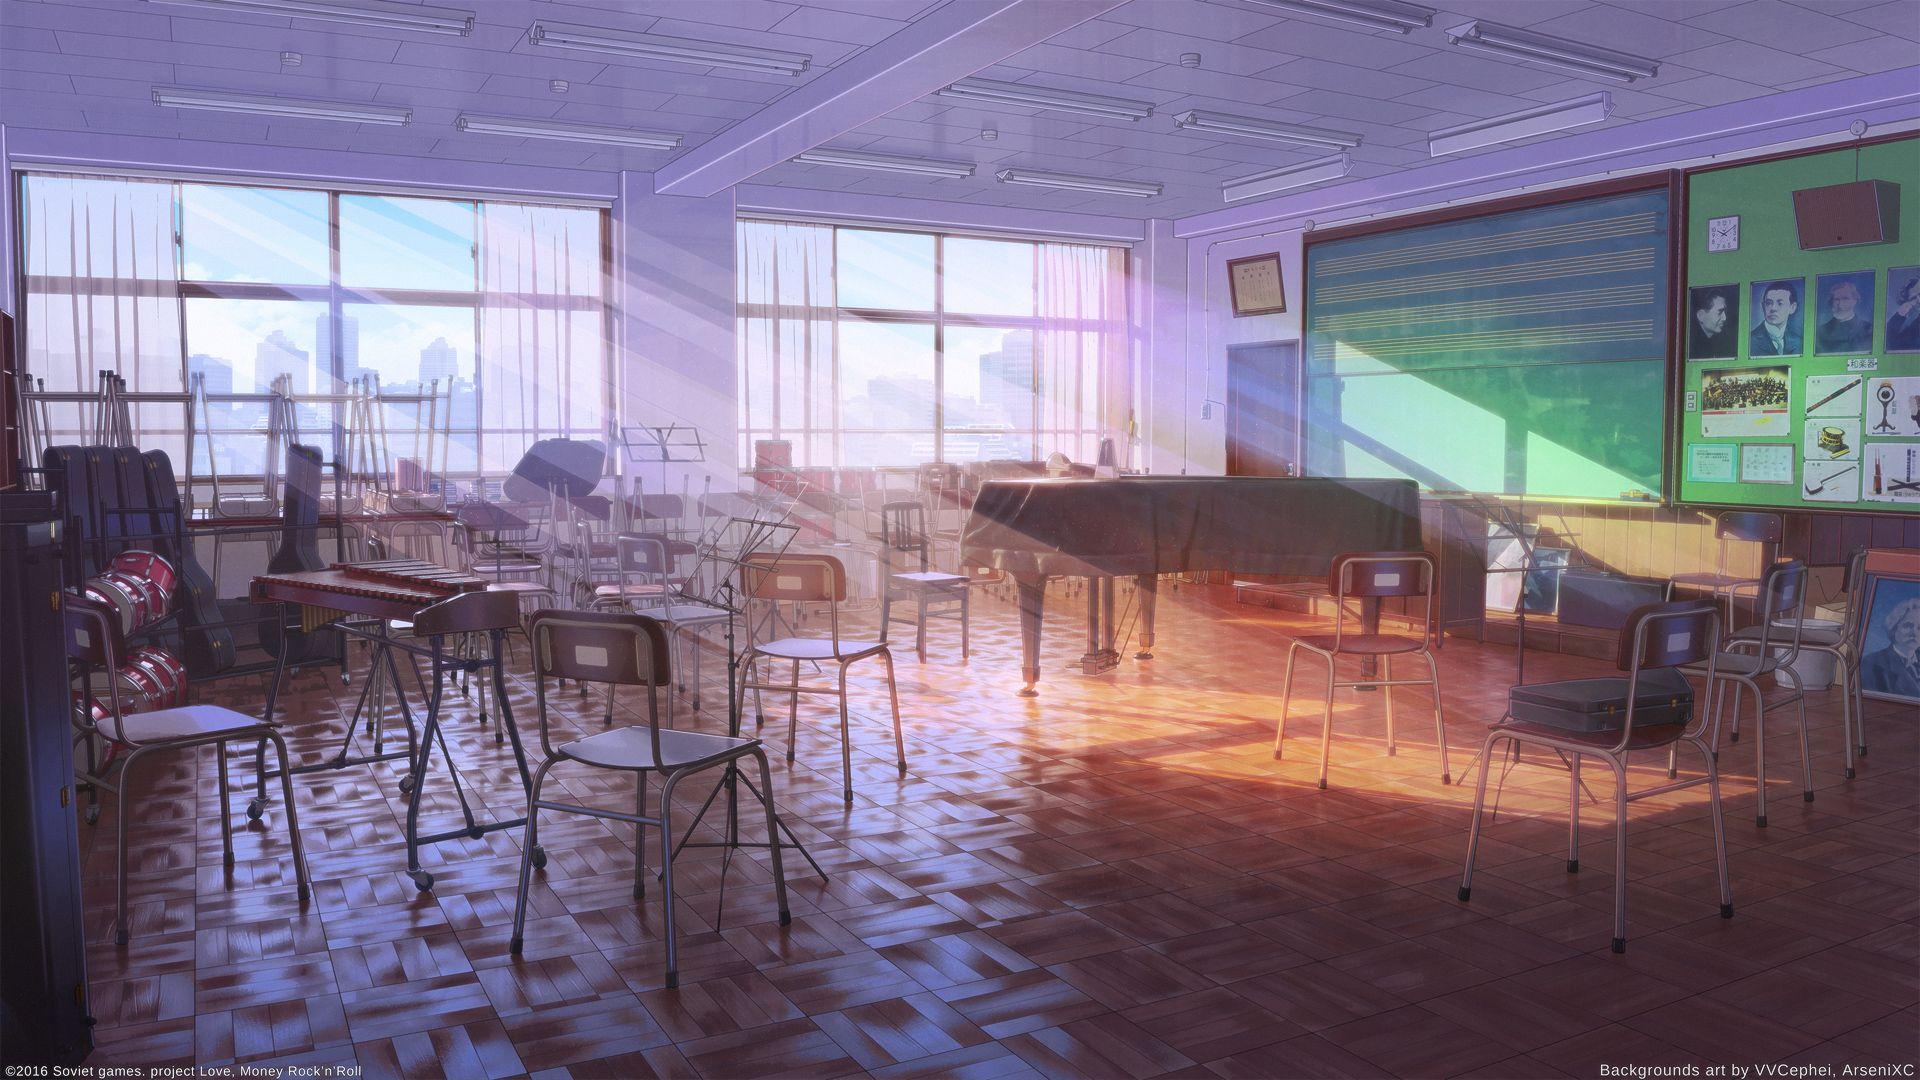 Music Class by arsenixc on DeviantArt (Arseniy Chebynkin